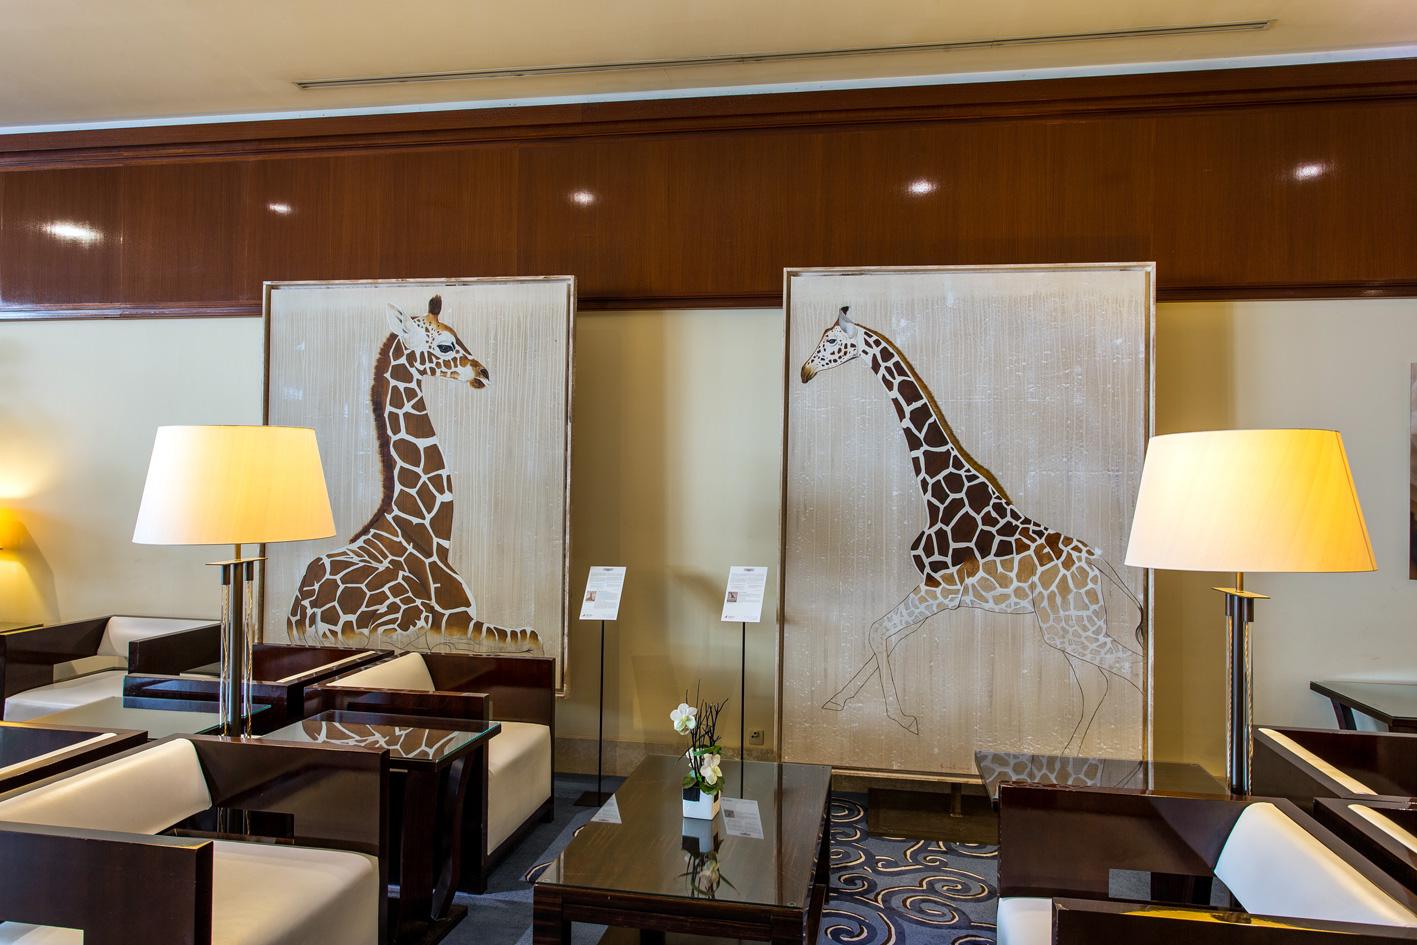 Hotel Fairmont Monaco Giraffe Rothschild Threatened Endangered Extinction Animal Painting